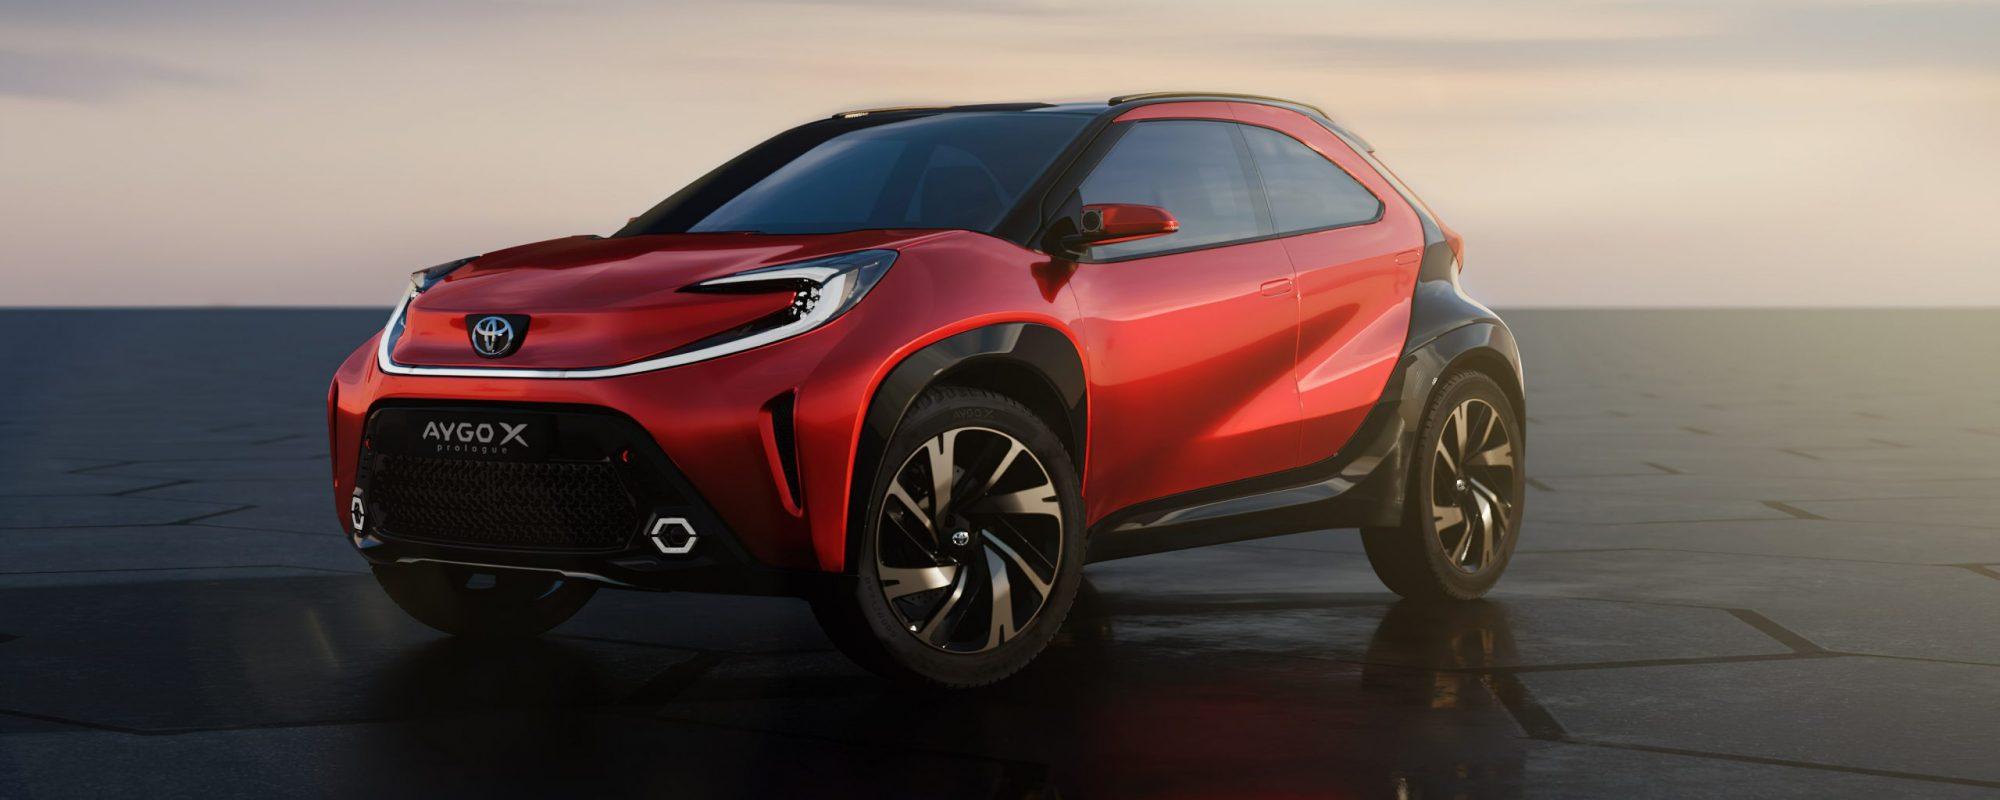 Aygo X prologue: verfrissende Toyota visie op A-segment